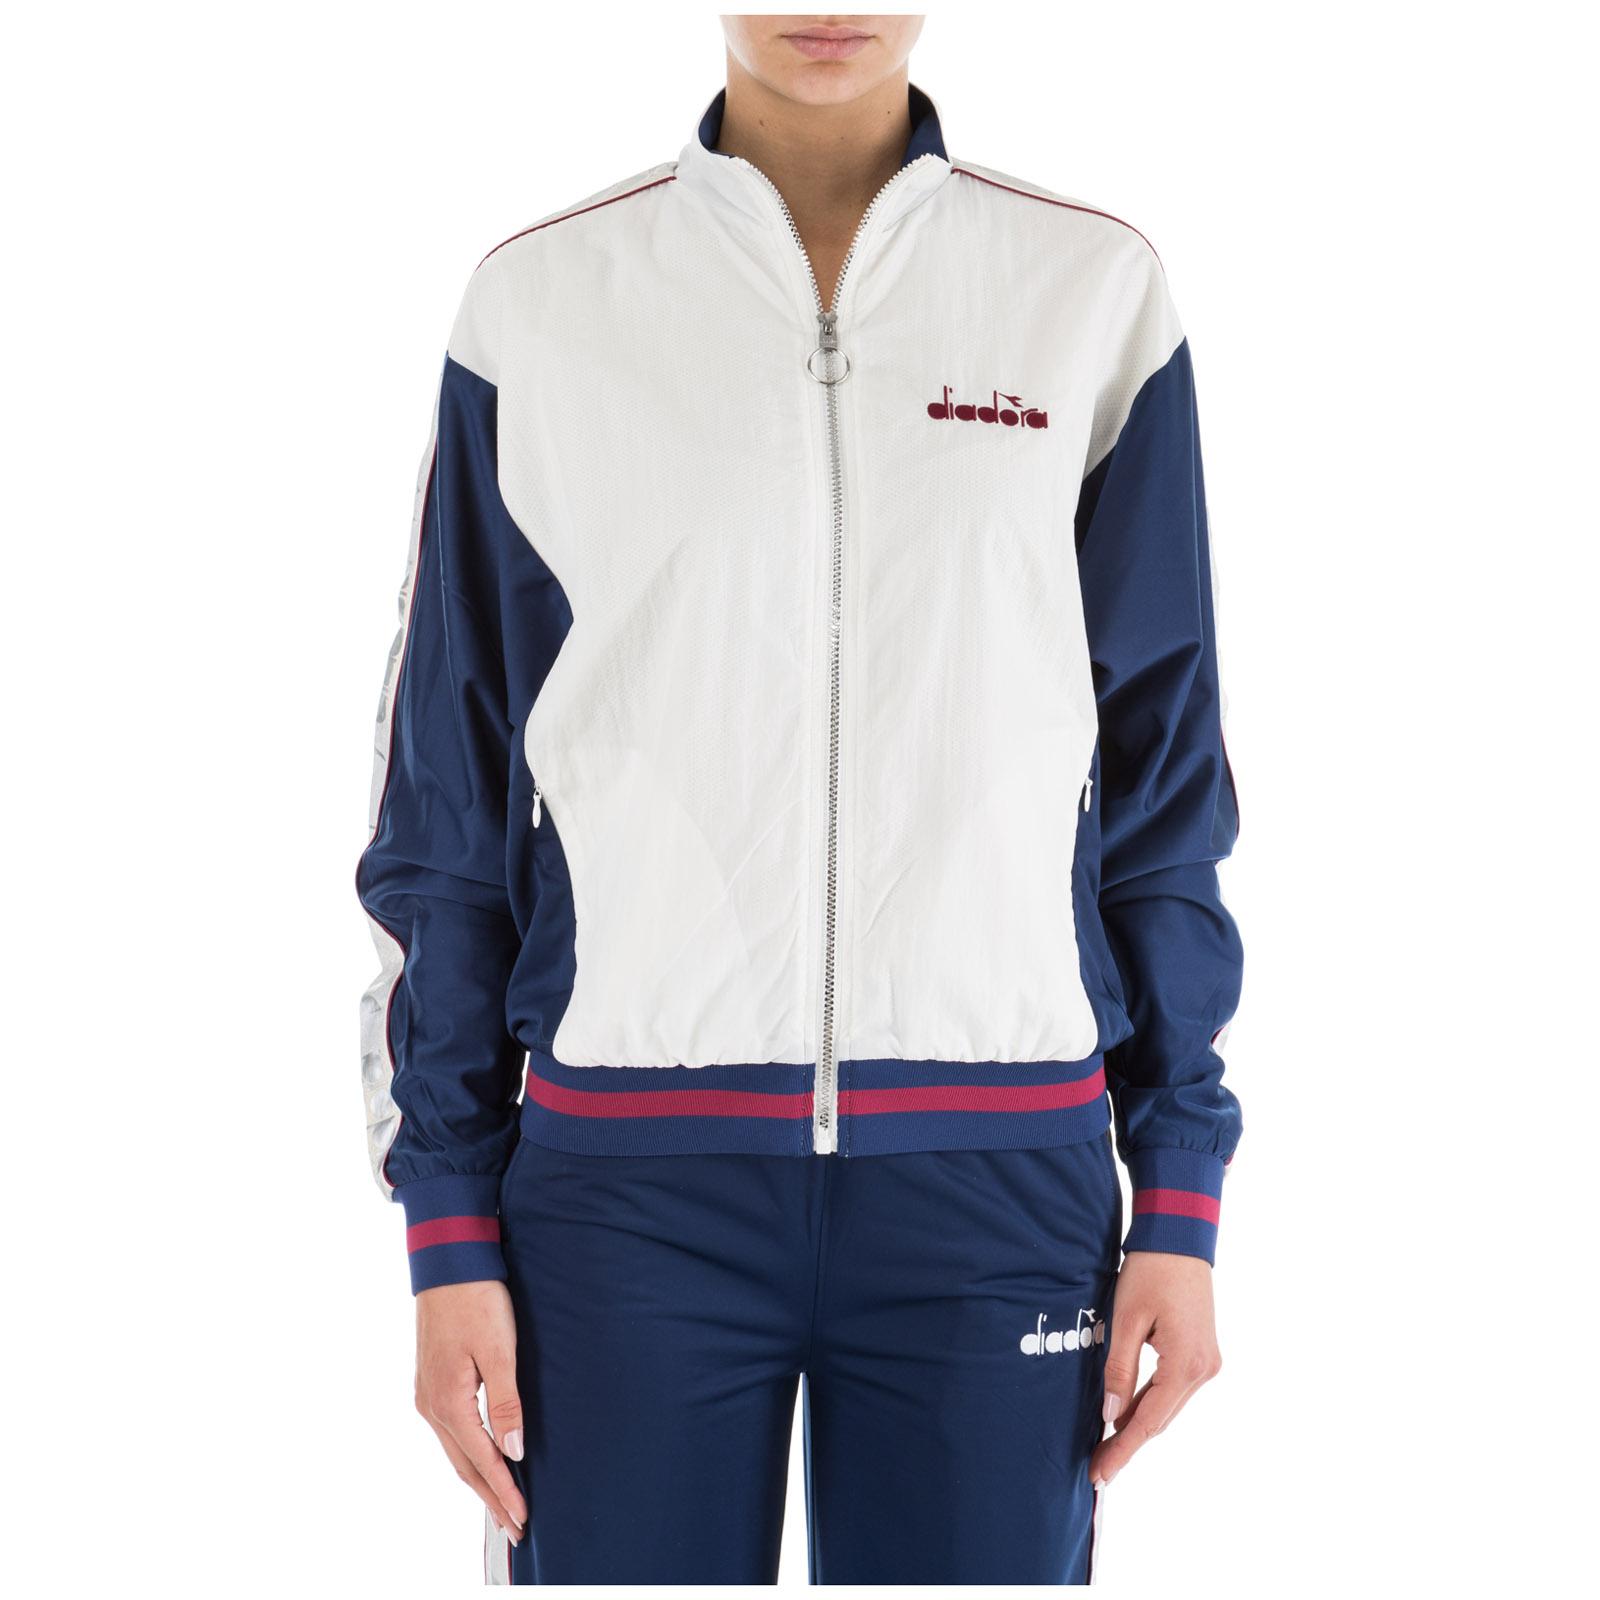 Sweatshirt Mit Zip Diadora 502 173640 Bianco Frmoda Com